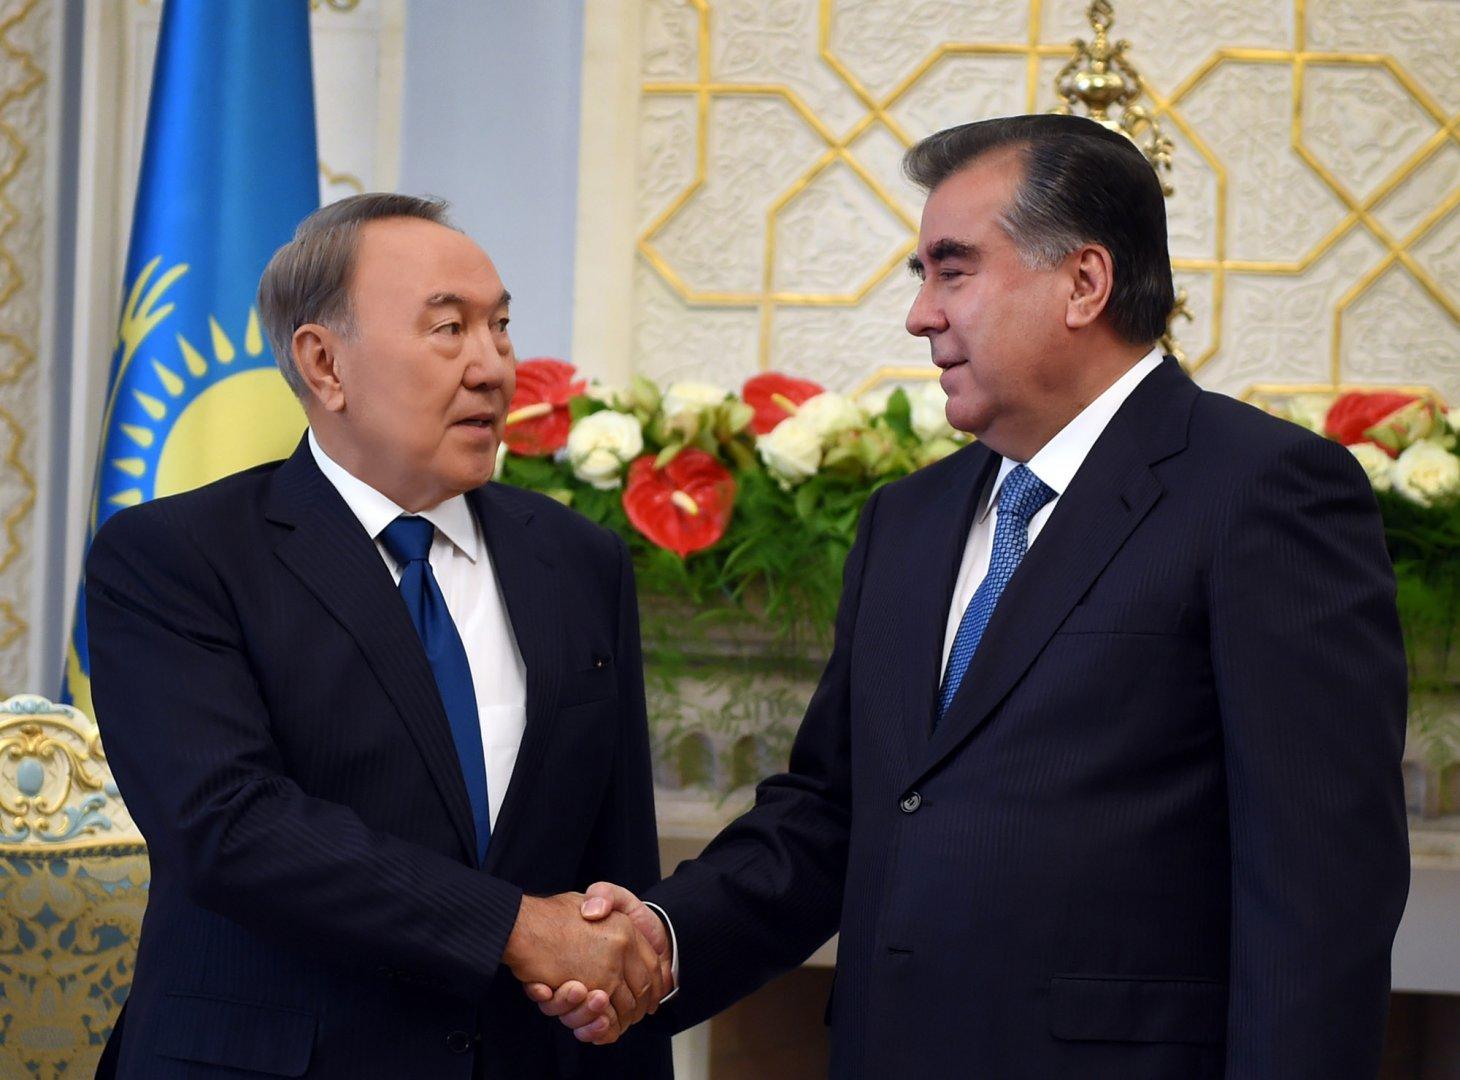 Президенты Казахстана и Таджикистана обсудили перспективы сотрудничества двух стран